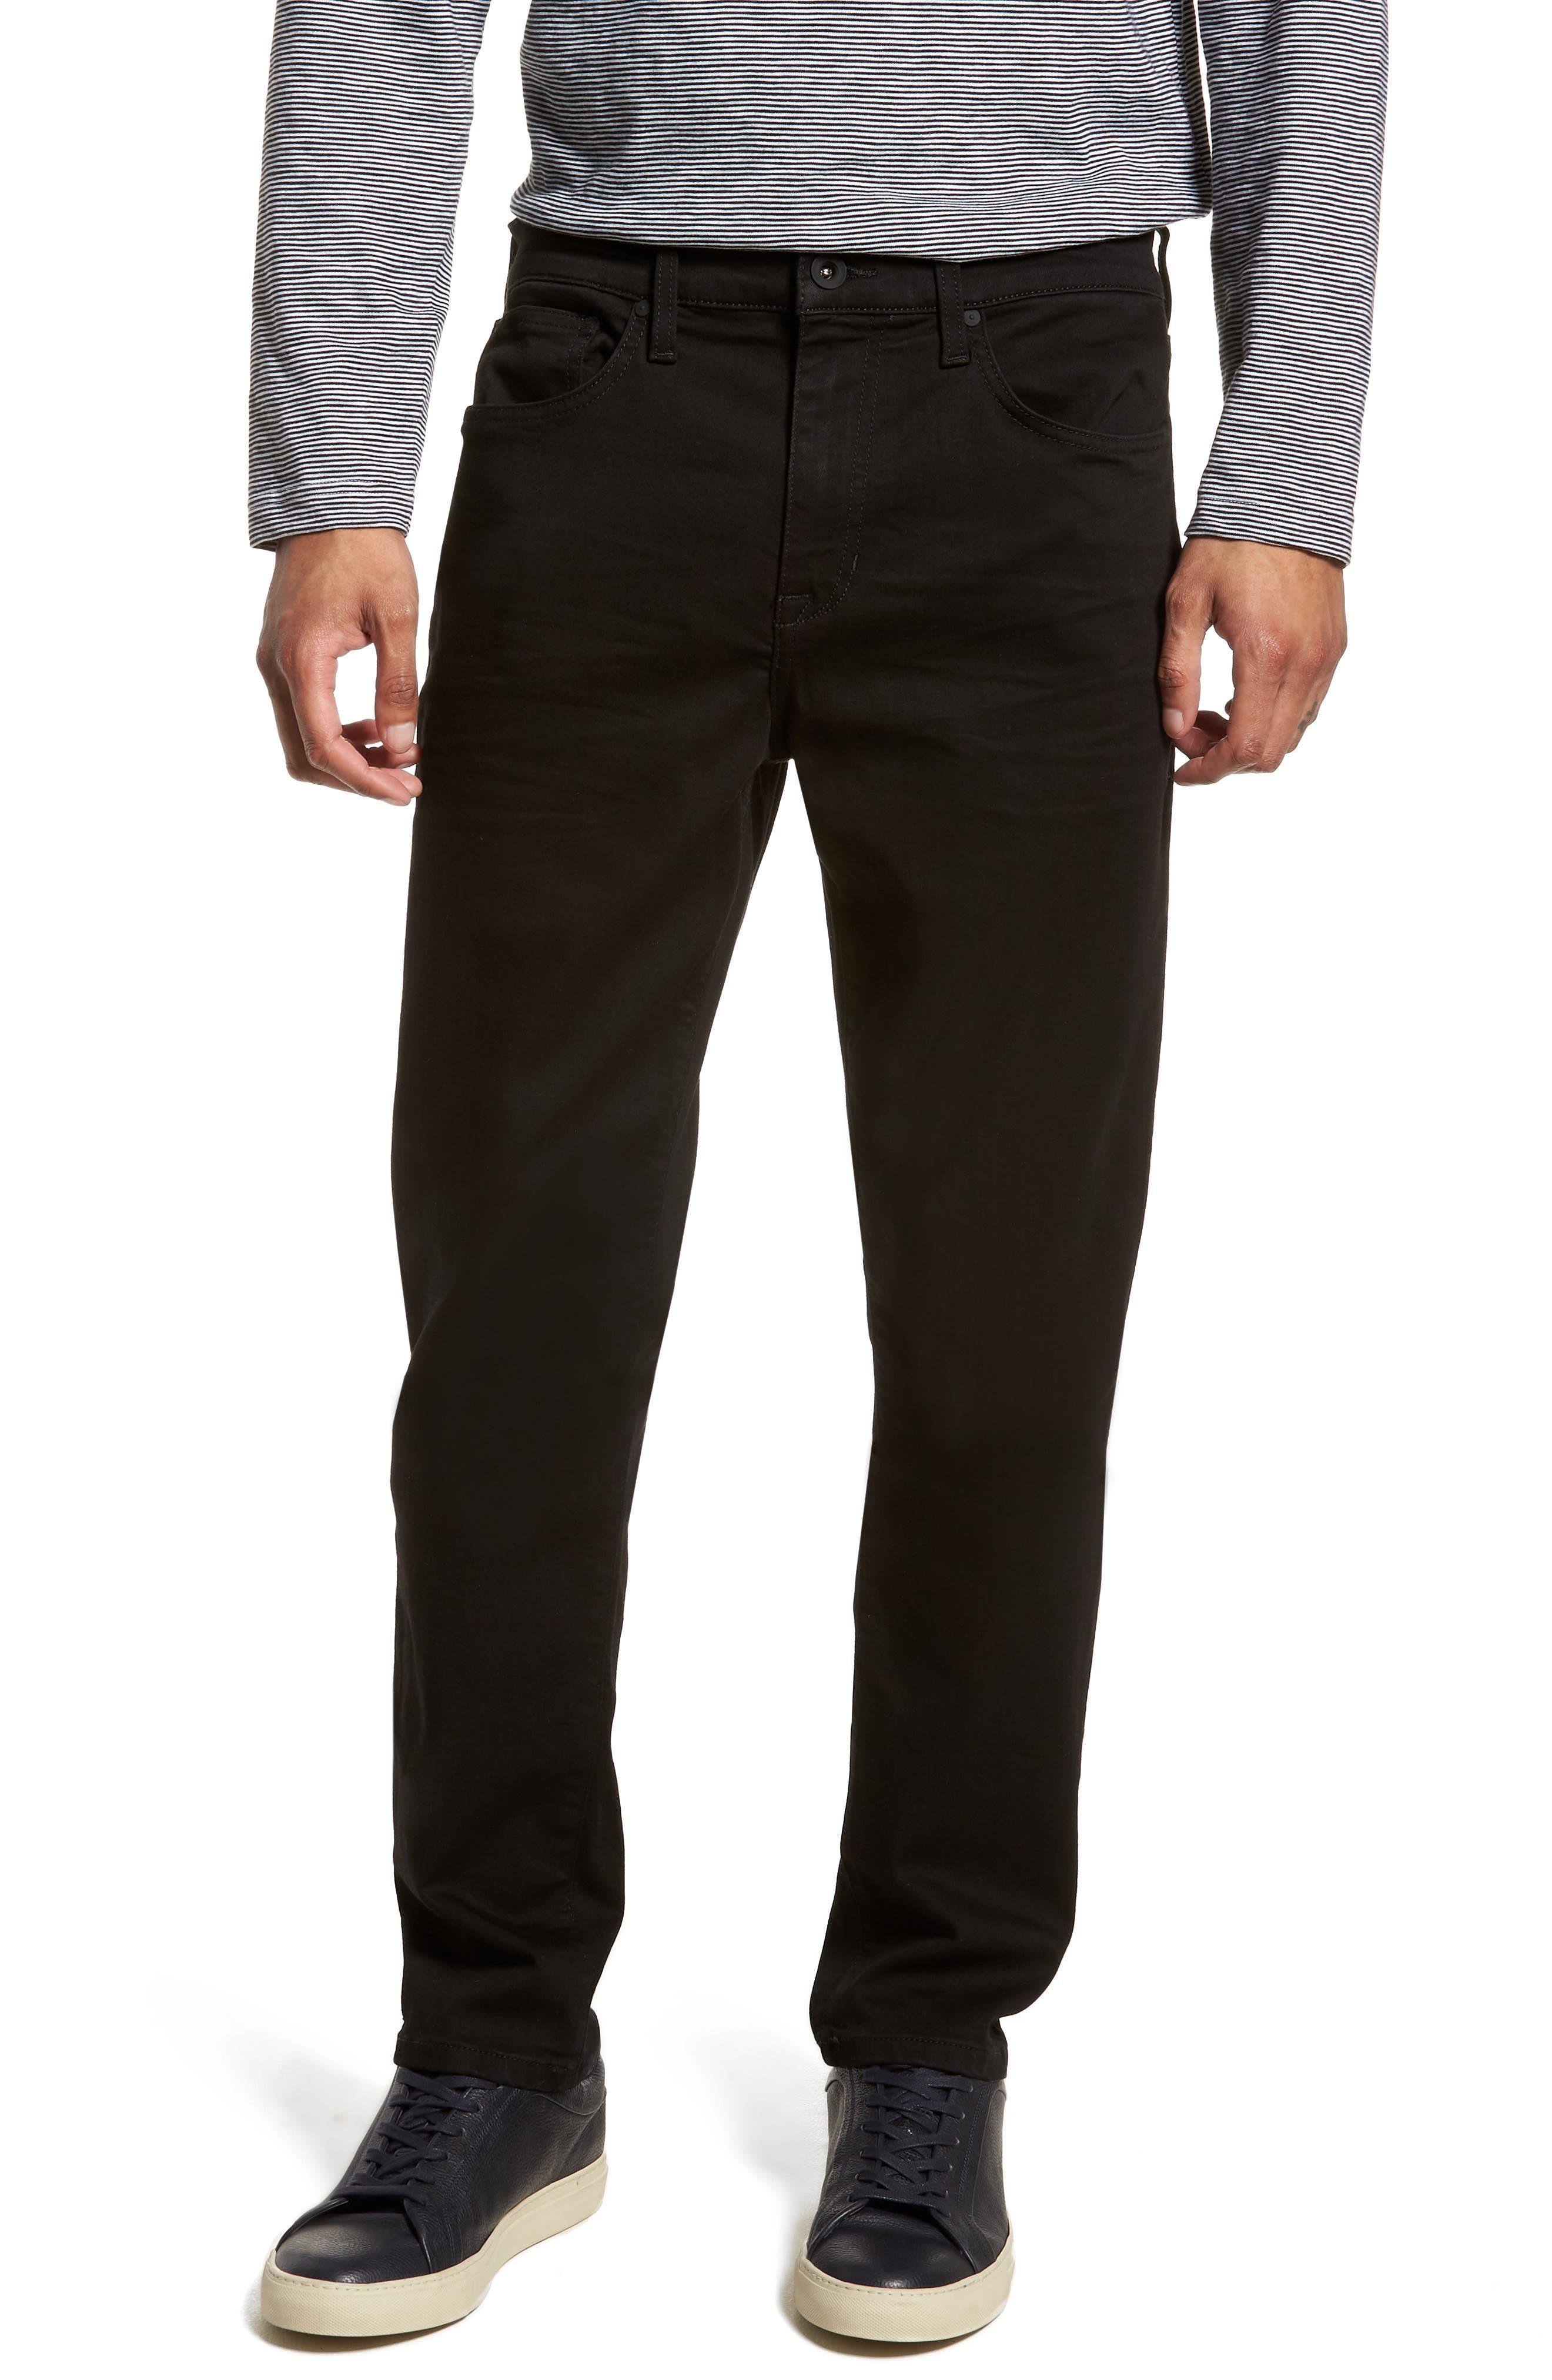 Folsom Athletic Slim Fit Jeans,                             Main thumbnail 1, color,                             EDLEMAN